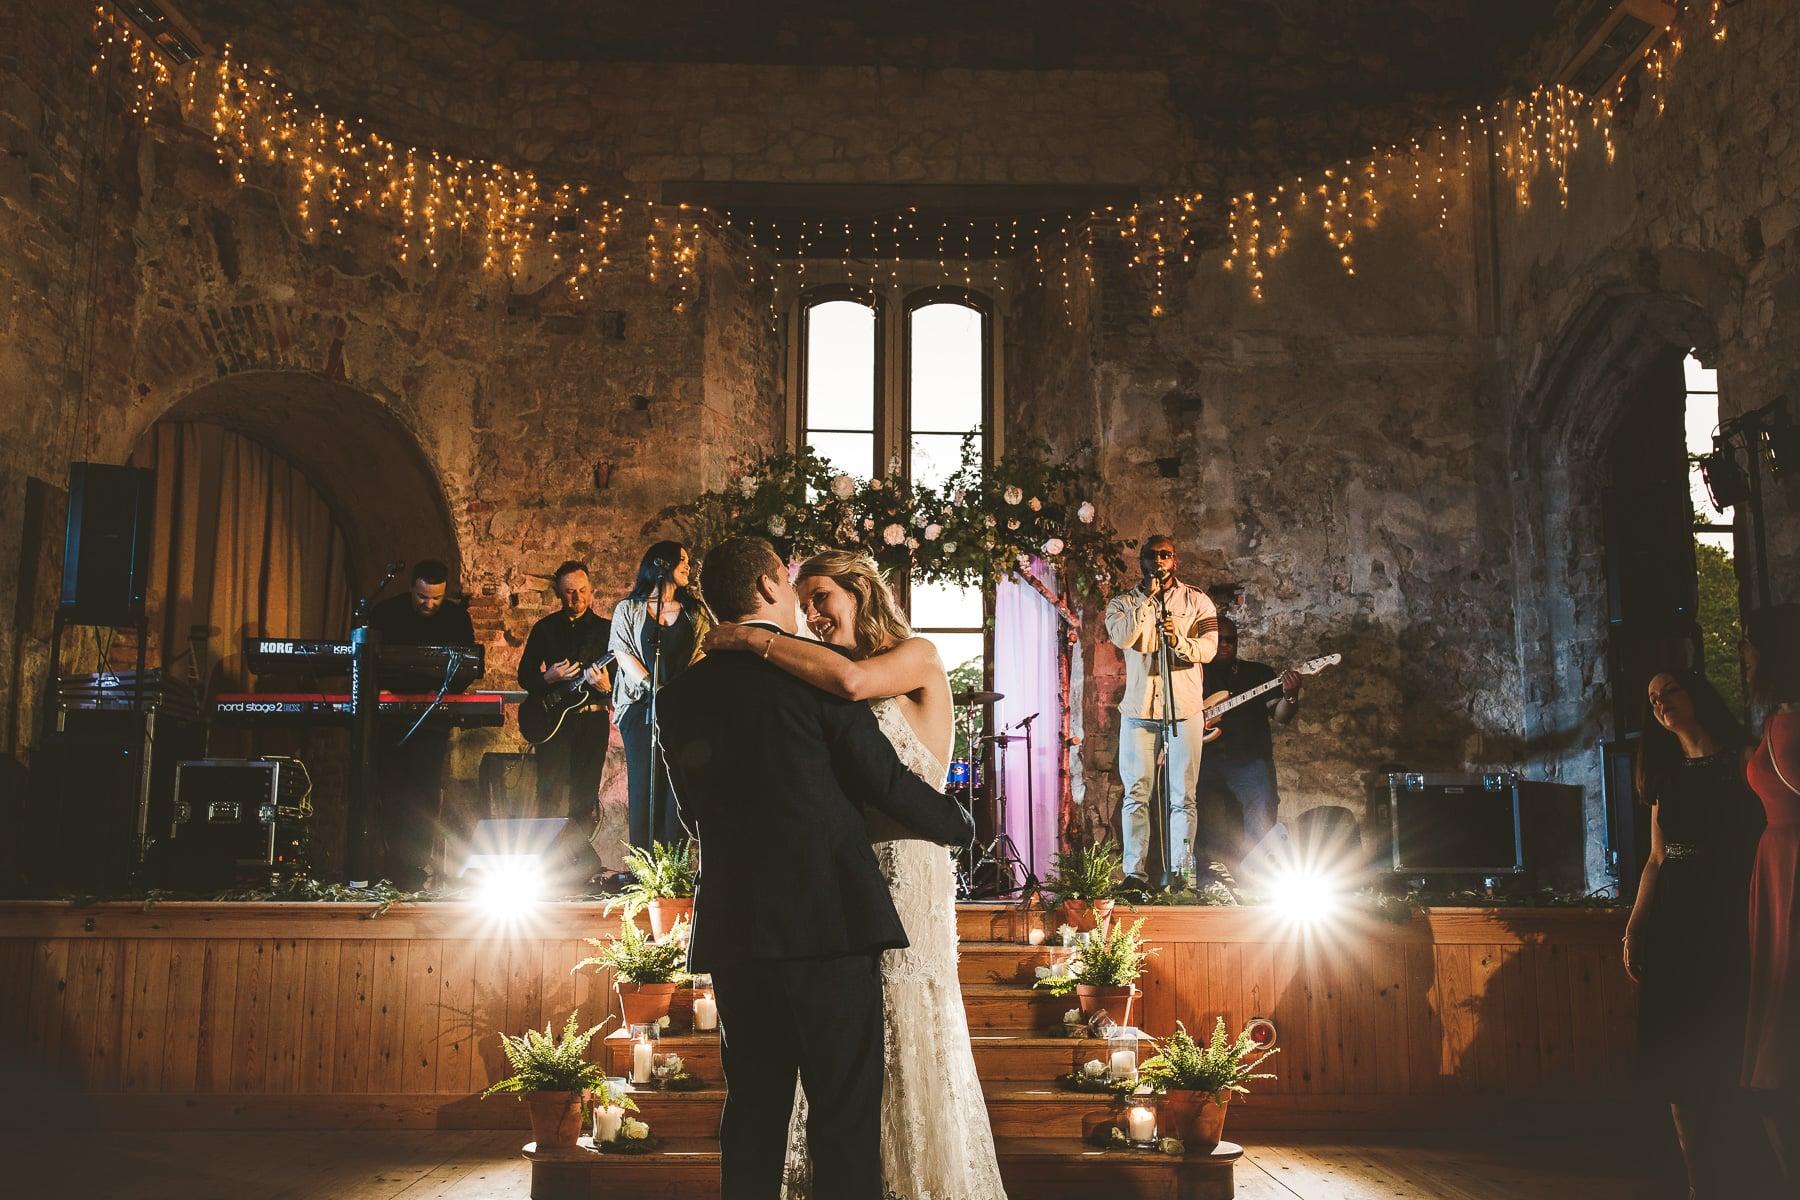 Lulworth-Castle-wedding-photographer-first-dance